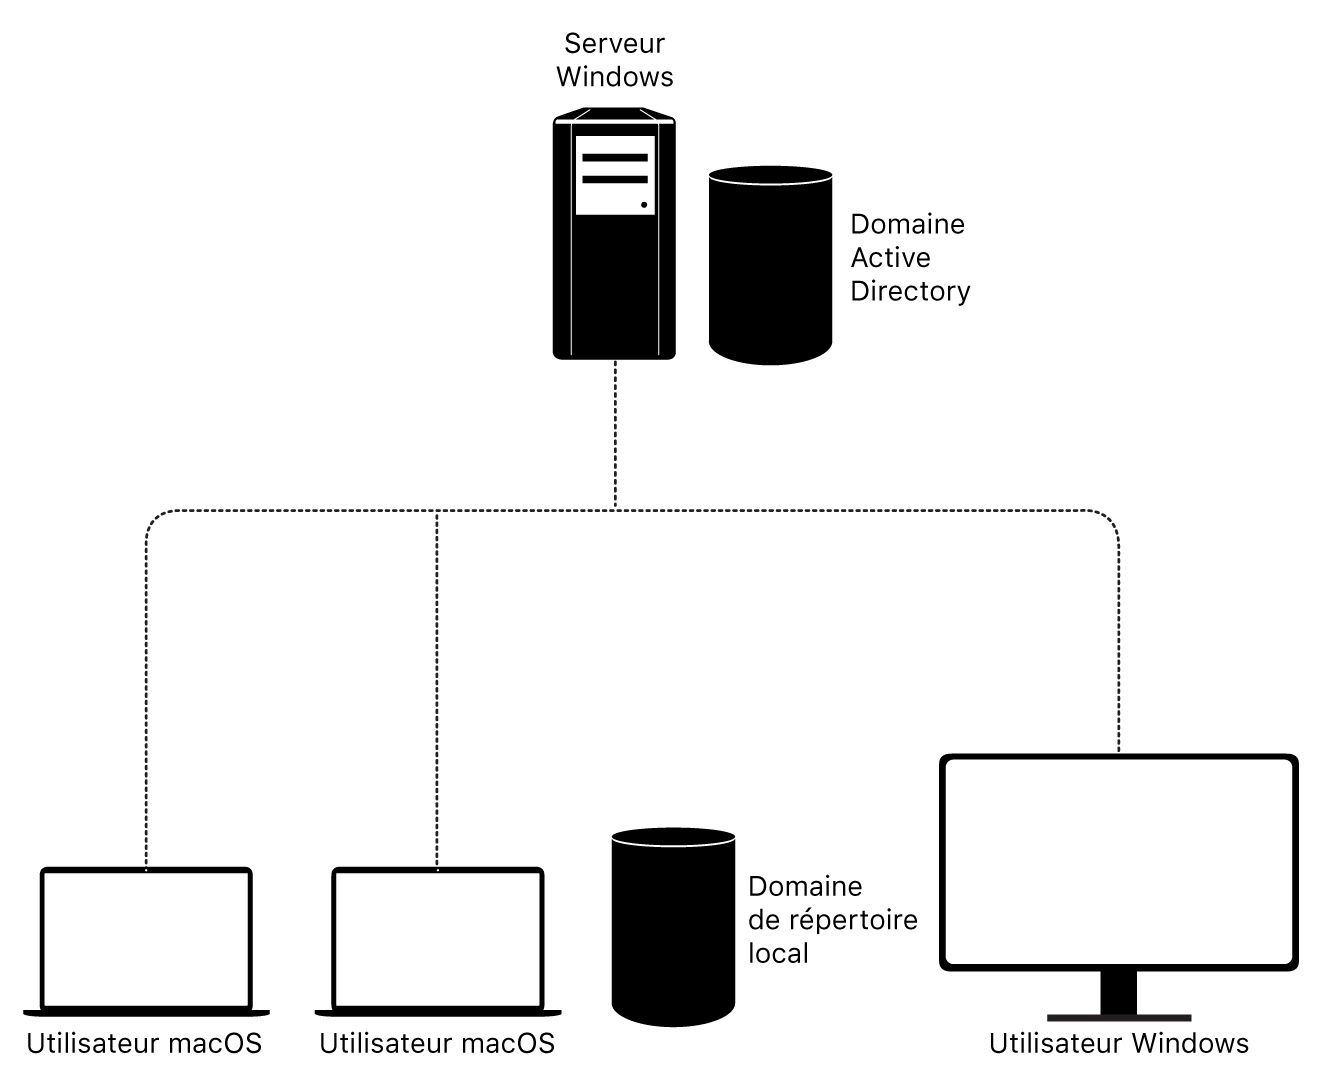 Prise en charge d'ActiveDirectory sous macOS